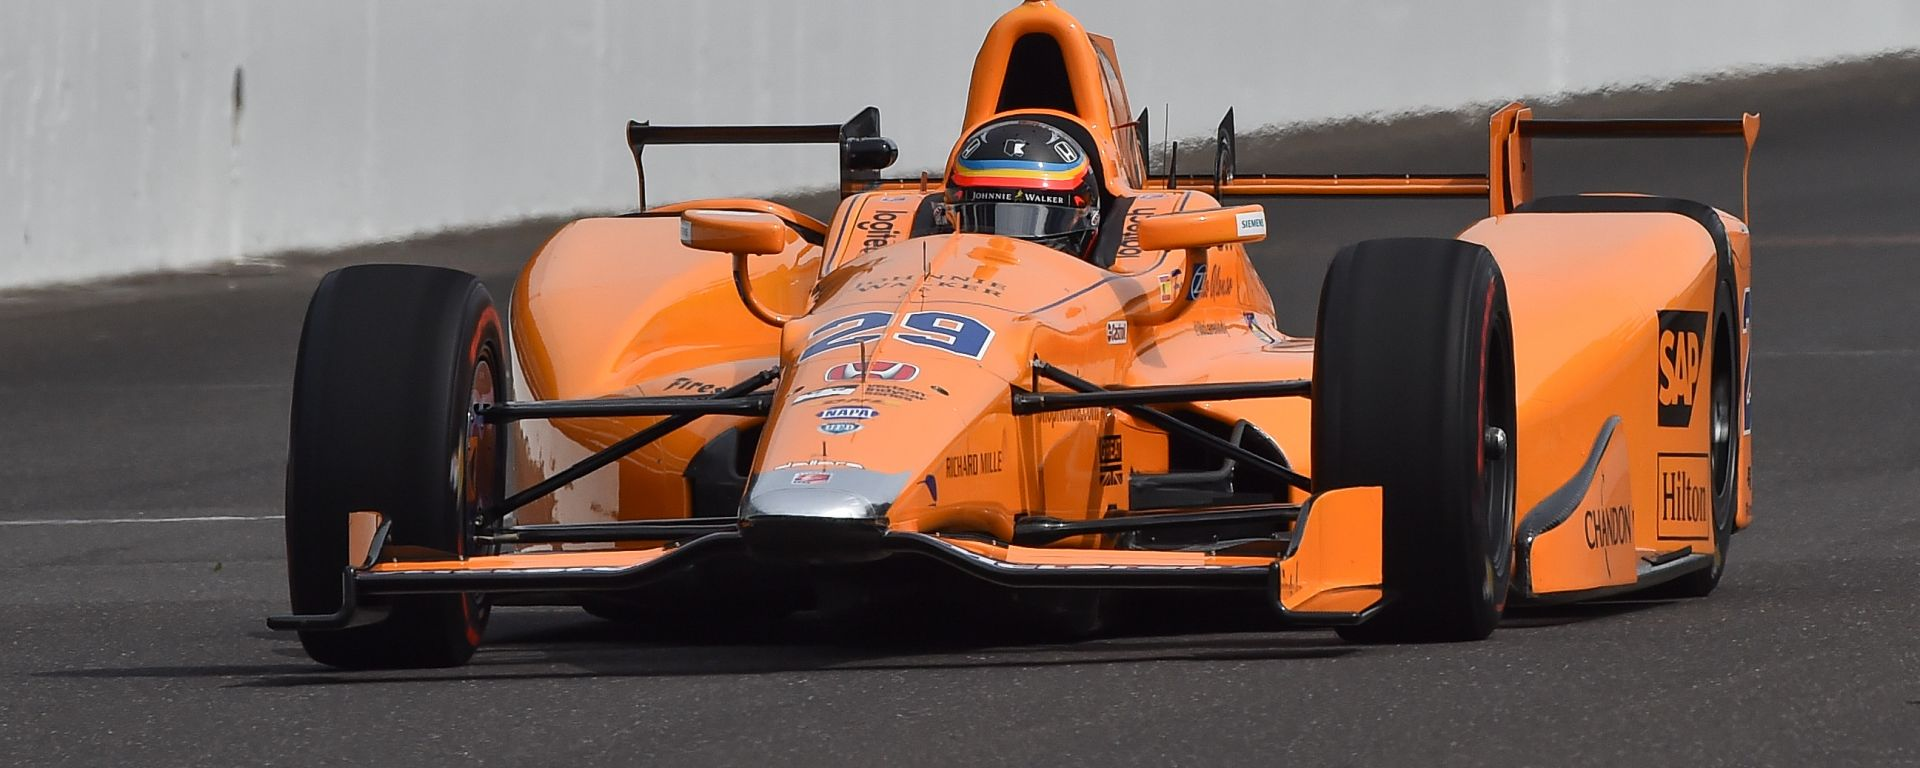 Indycar, Fernando Alonso nella Indy500 del 2017